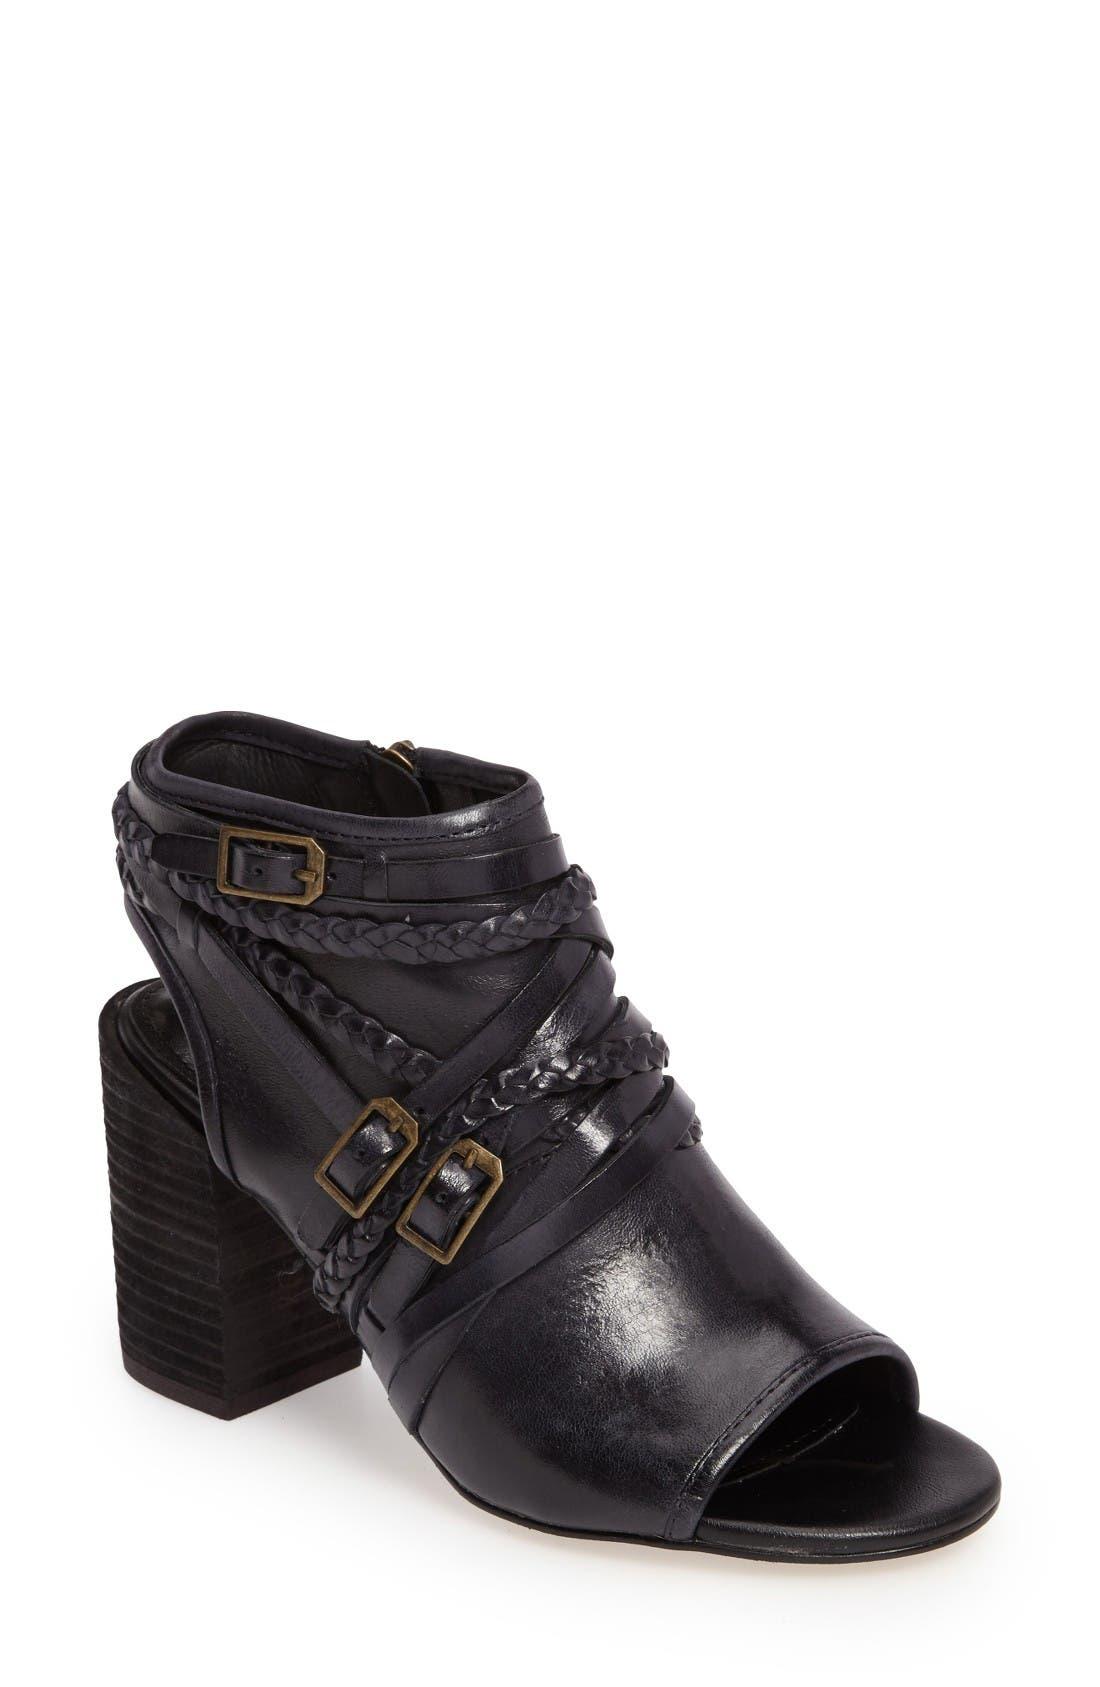 Main Image - Isolá Leonora Strappy Block Heel Sandal (Women)